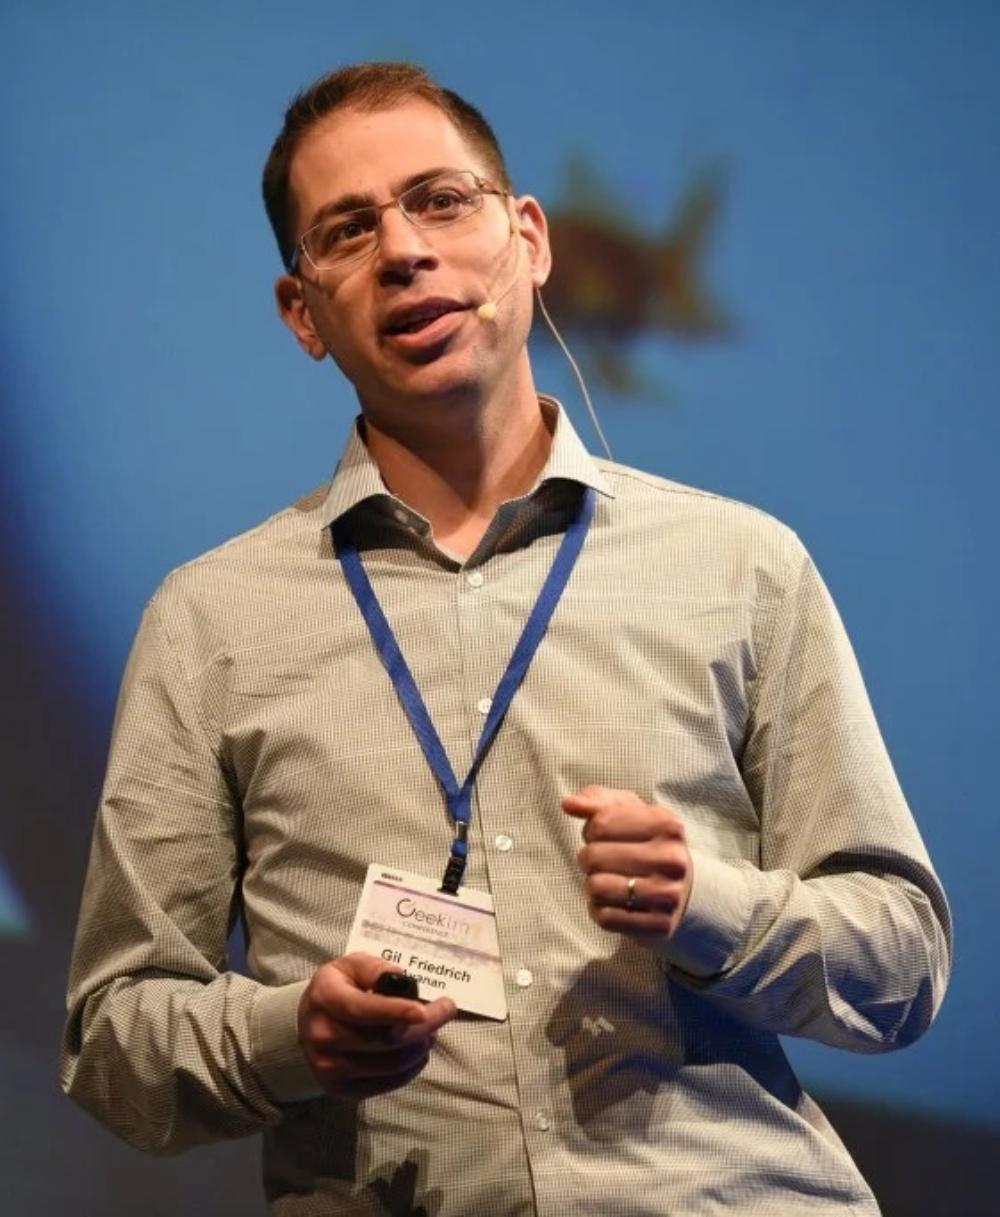 Gil Friedrich, CEO, Avanan.